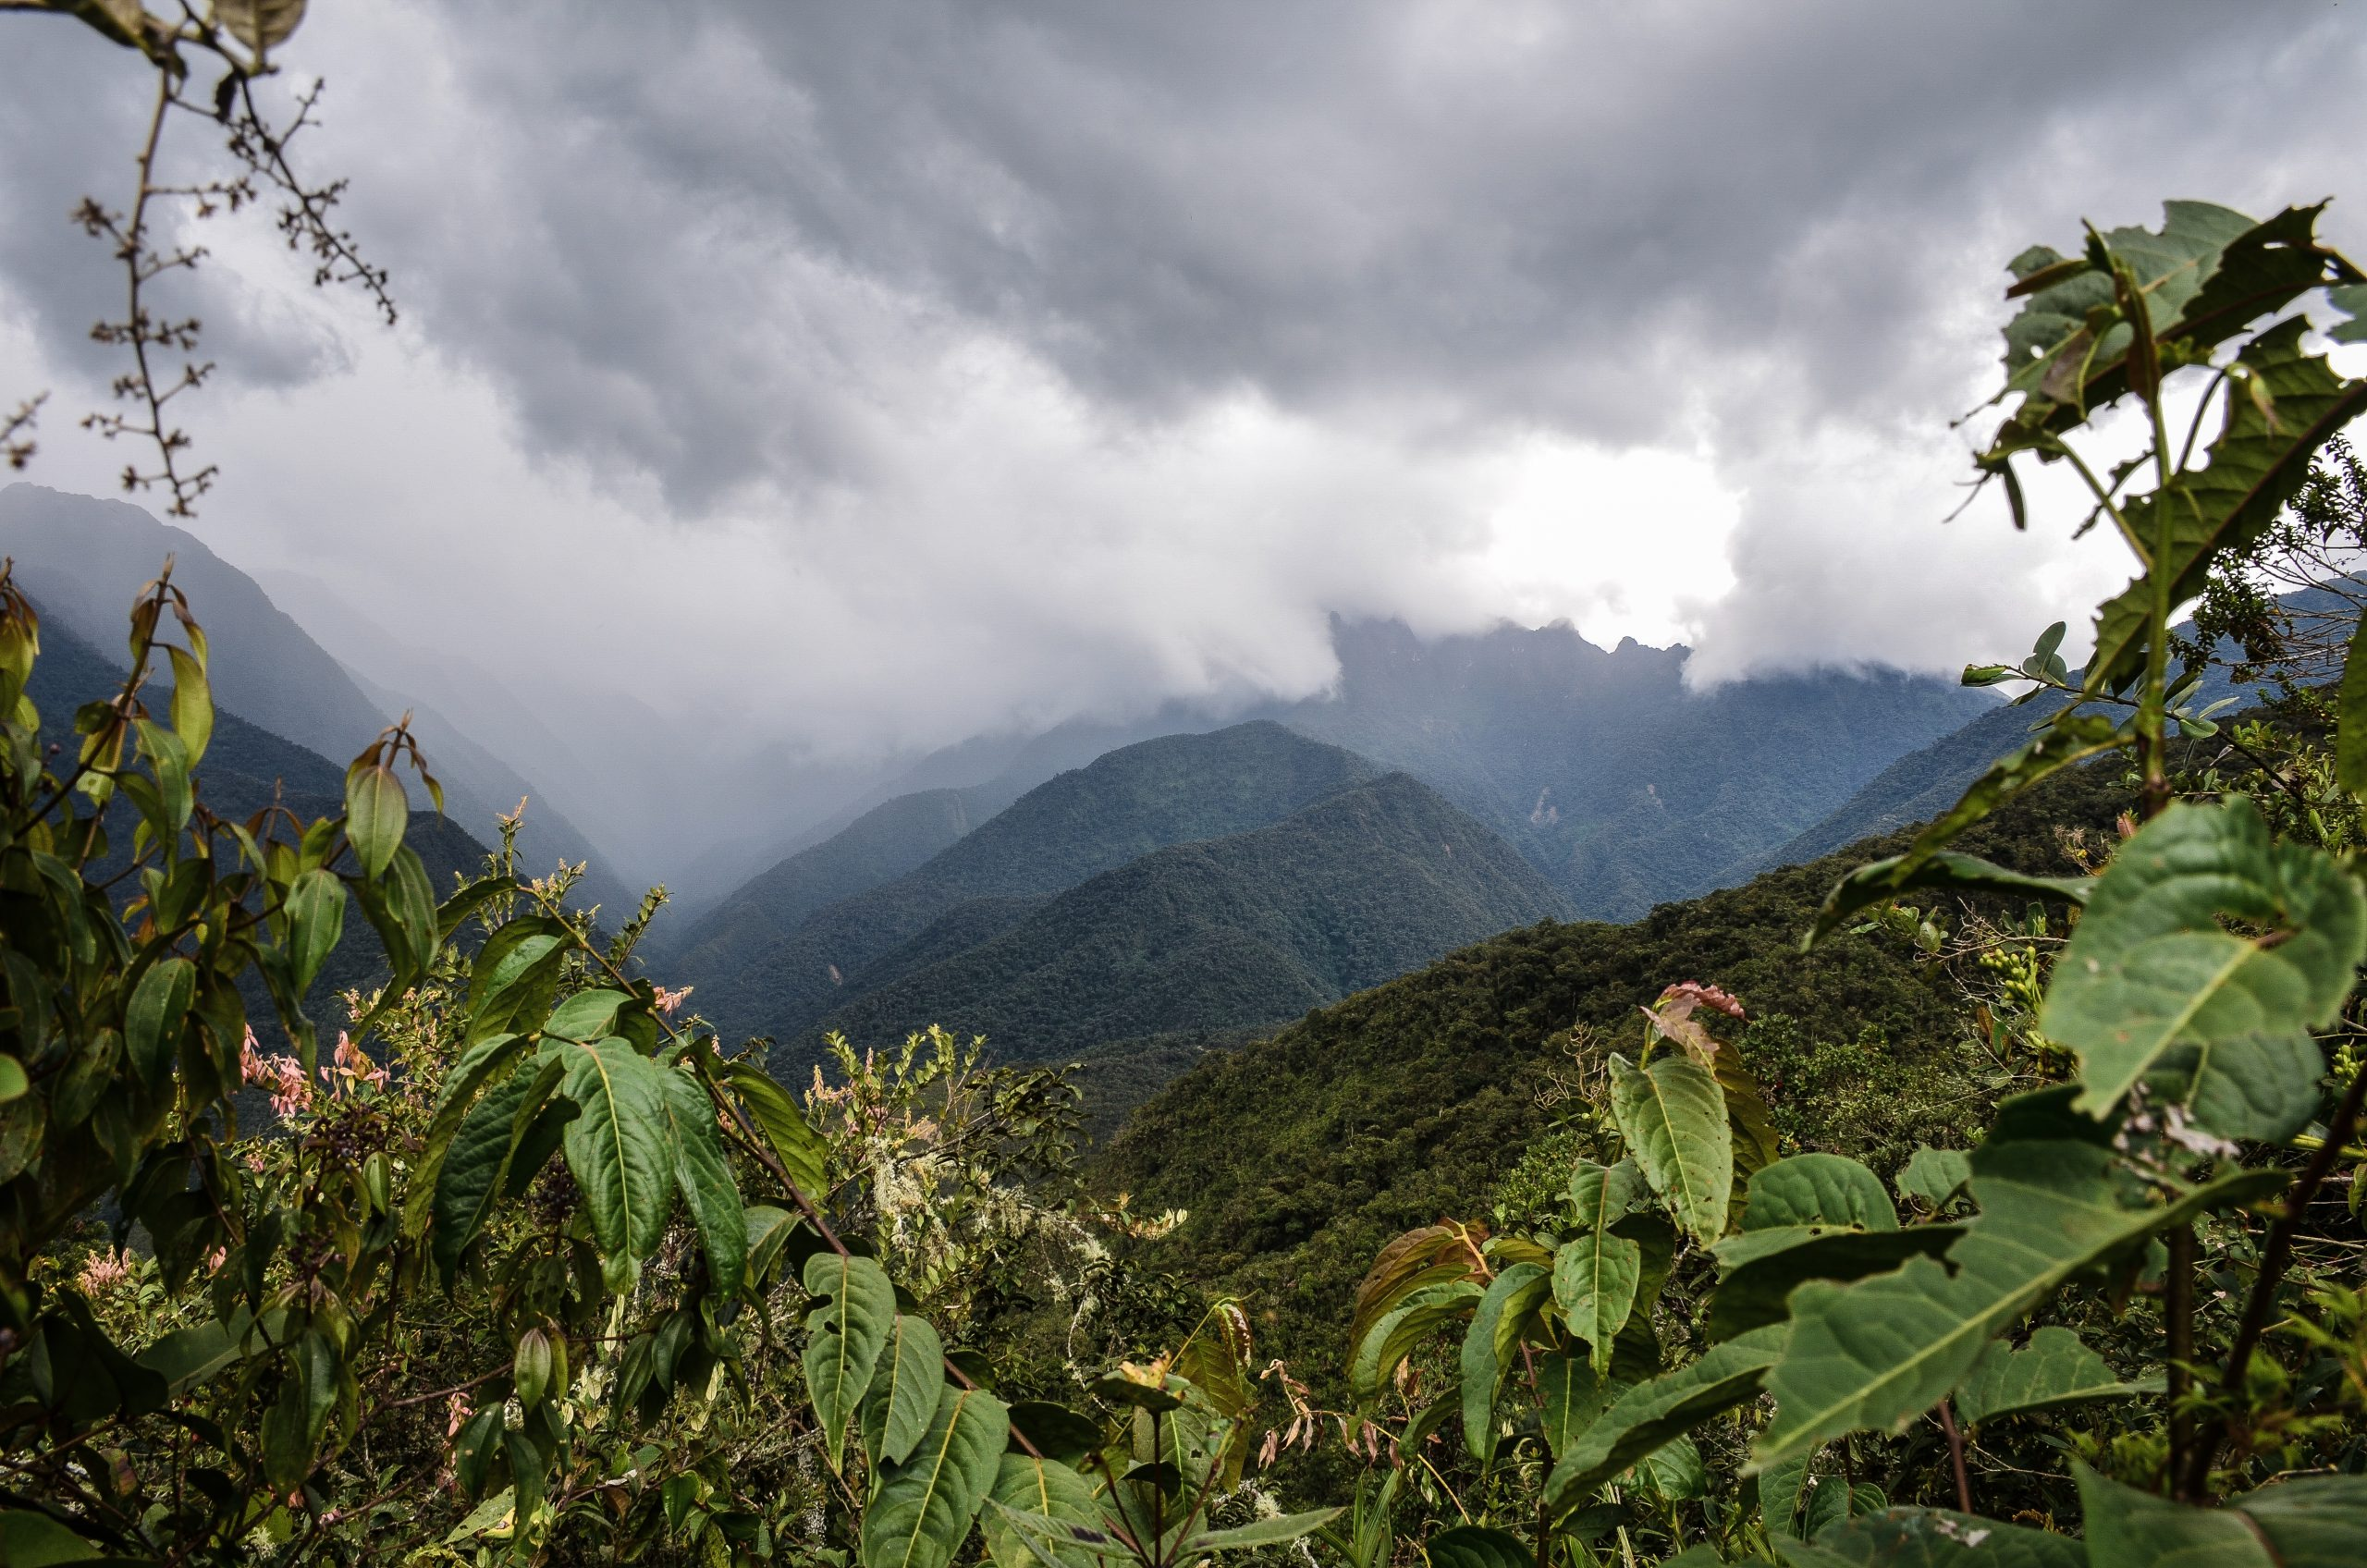 Tunkimayo - Quillabamba - La Convencion - Pasion Andina